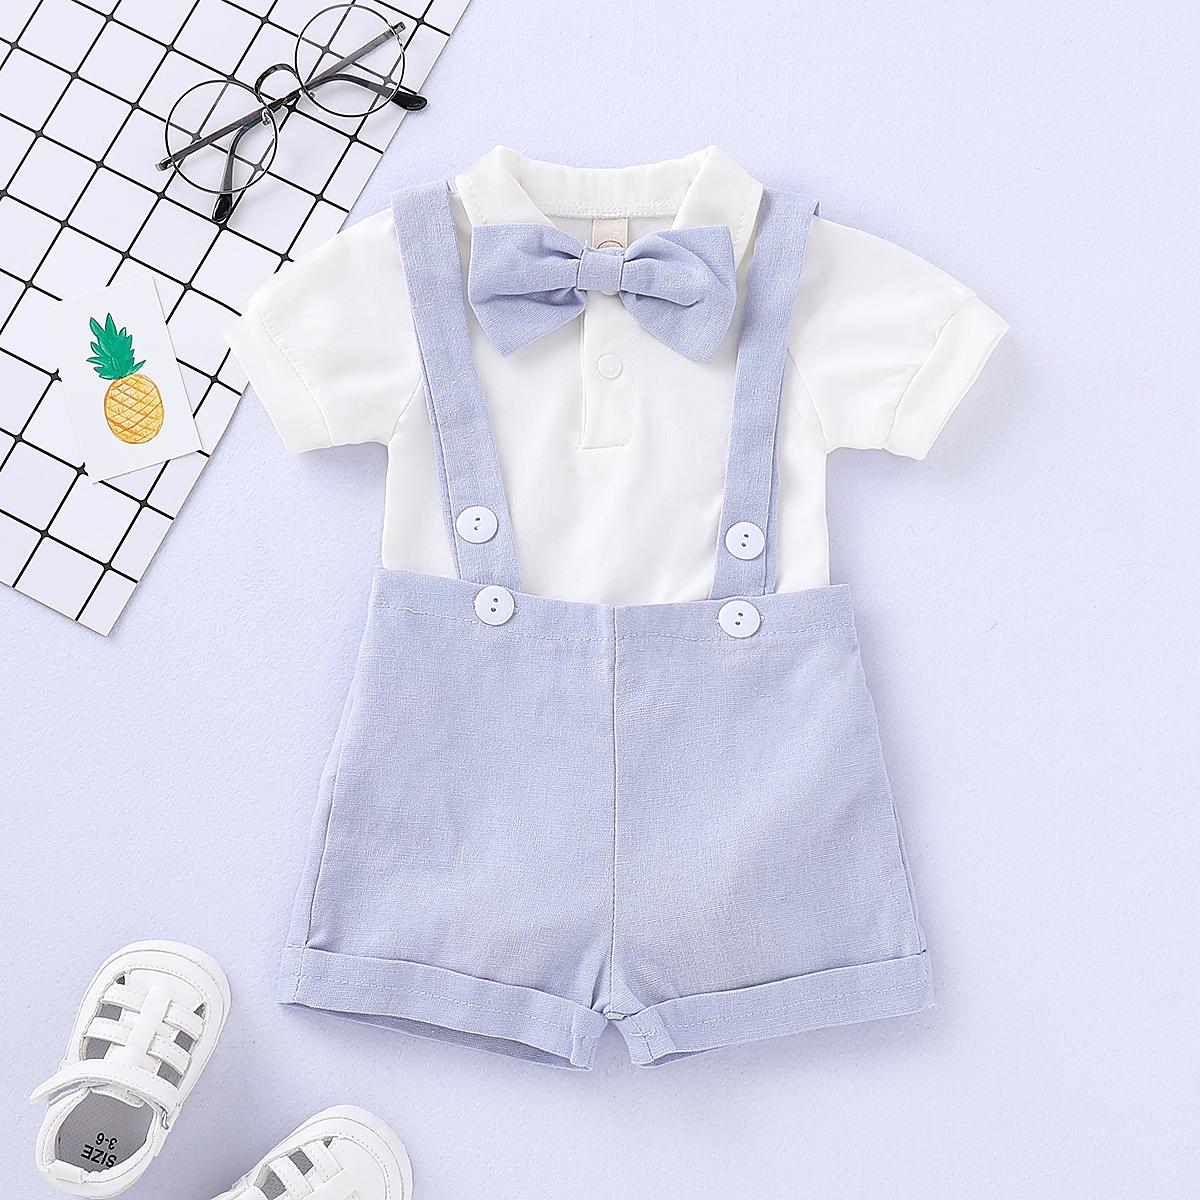 Baby Wear|Girls Handsome Solid Bow Tie Bodysuit and Suspender Shorts Set